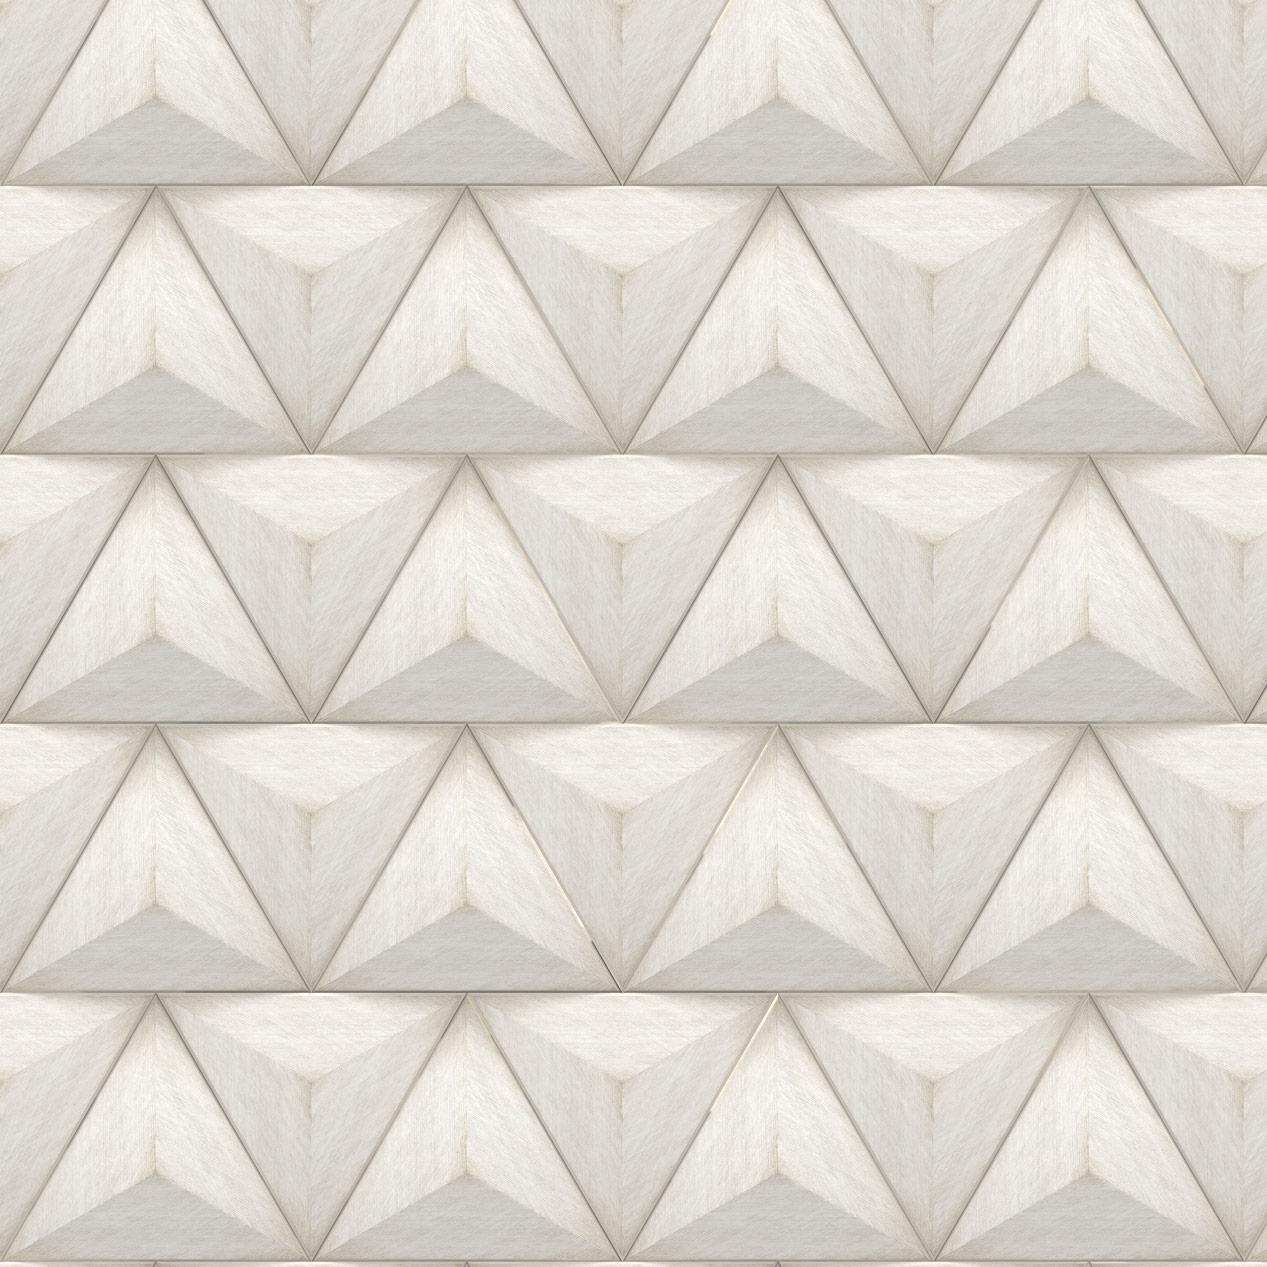 Papel de Parede Geométrico Triângulo Amadeirado Estilo 3D